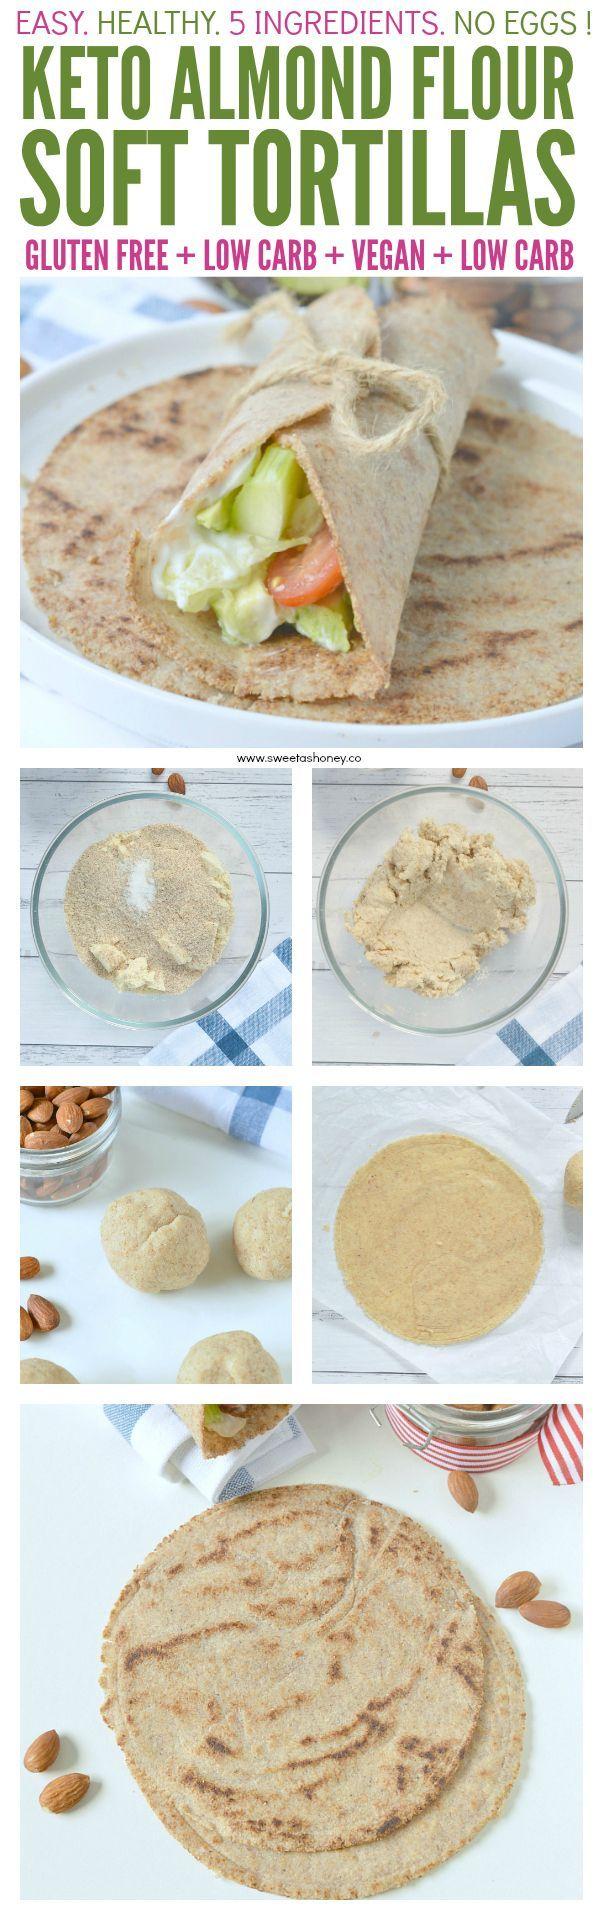 -   Almond flour tortillas keto + low carb + vegan. An easy 5 ingredients recipe to make delicious homemade wraps.